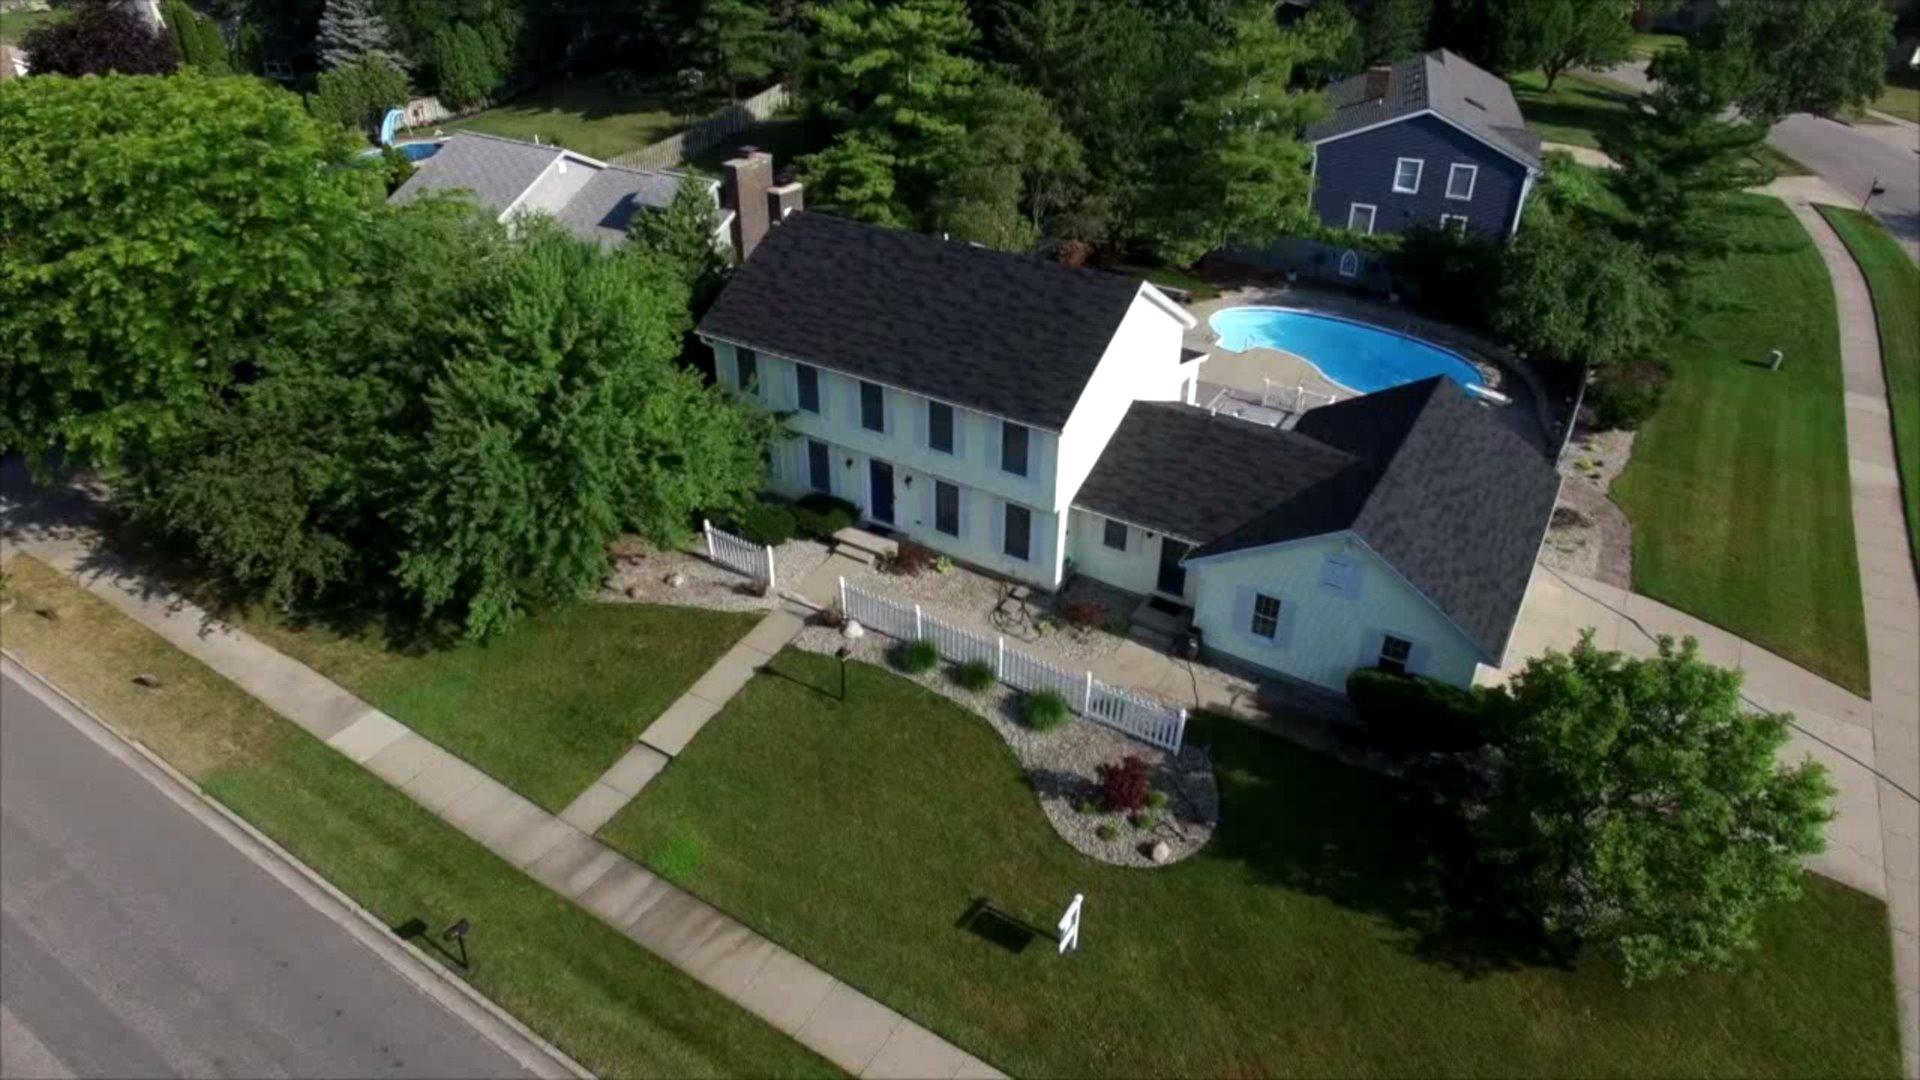 fox17online.com - Nicole DiDonato - West Michigan real estate market remaining steady through pandemic